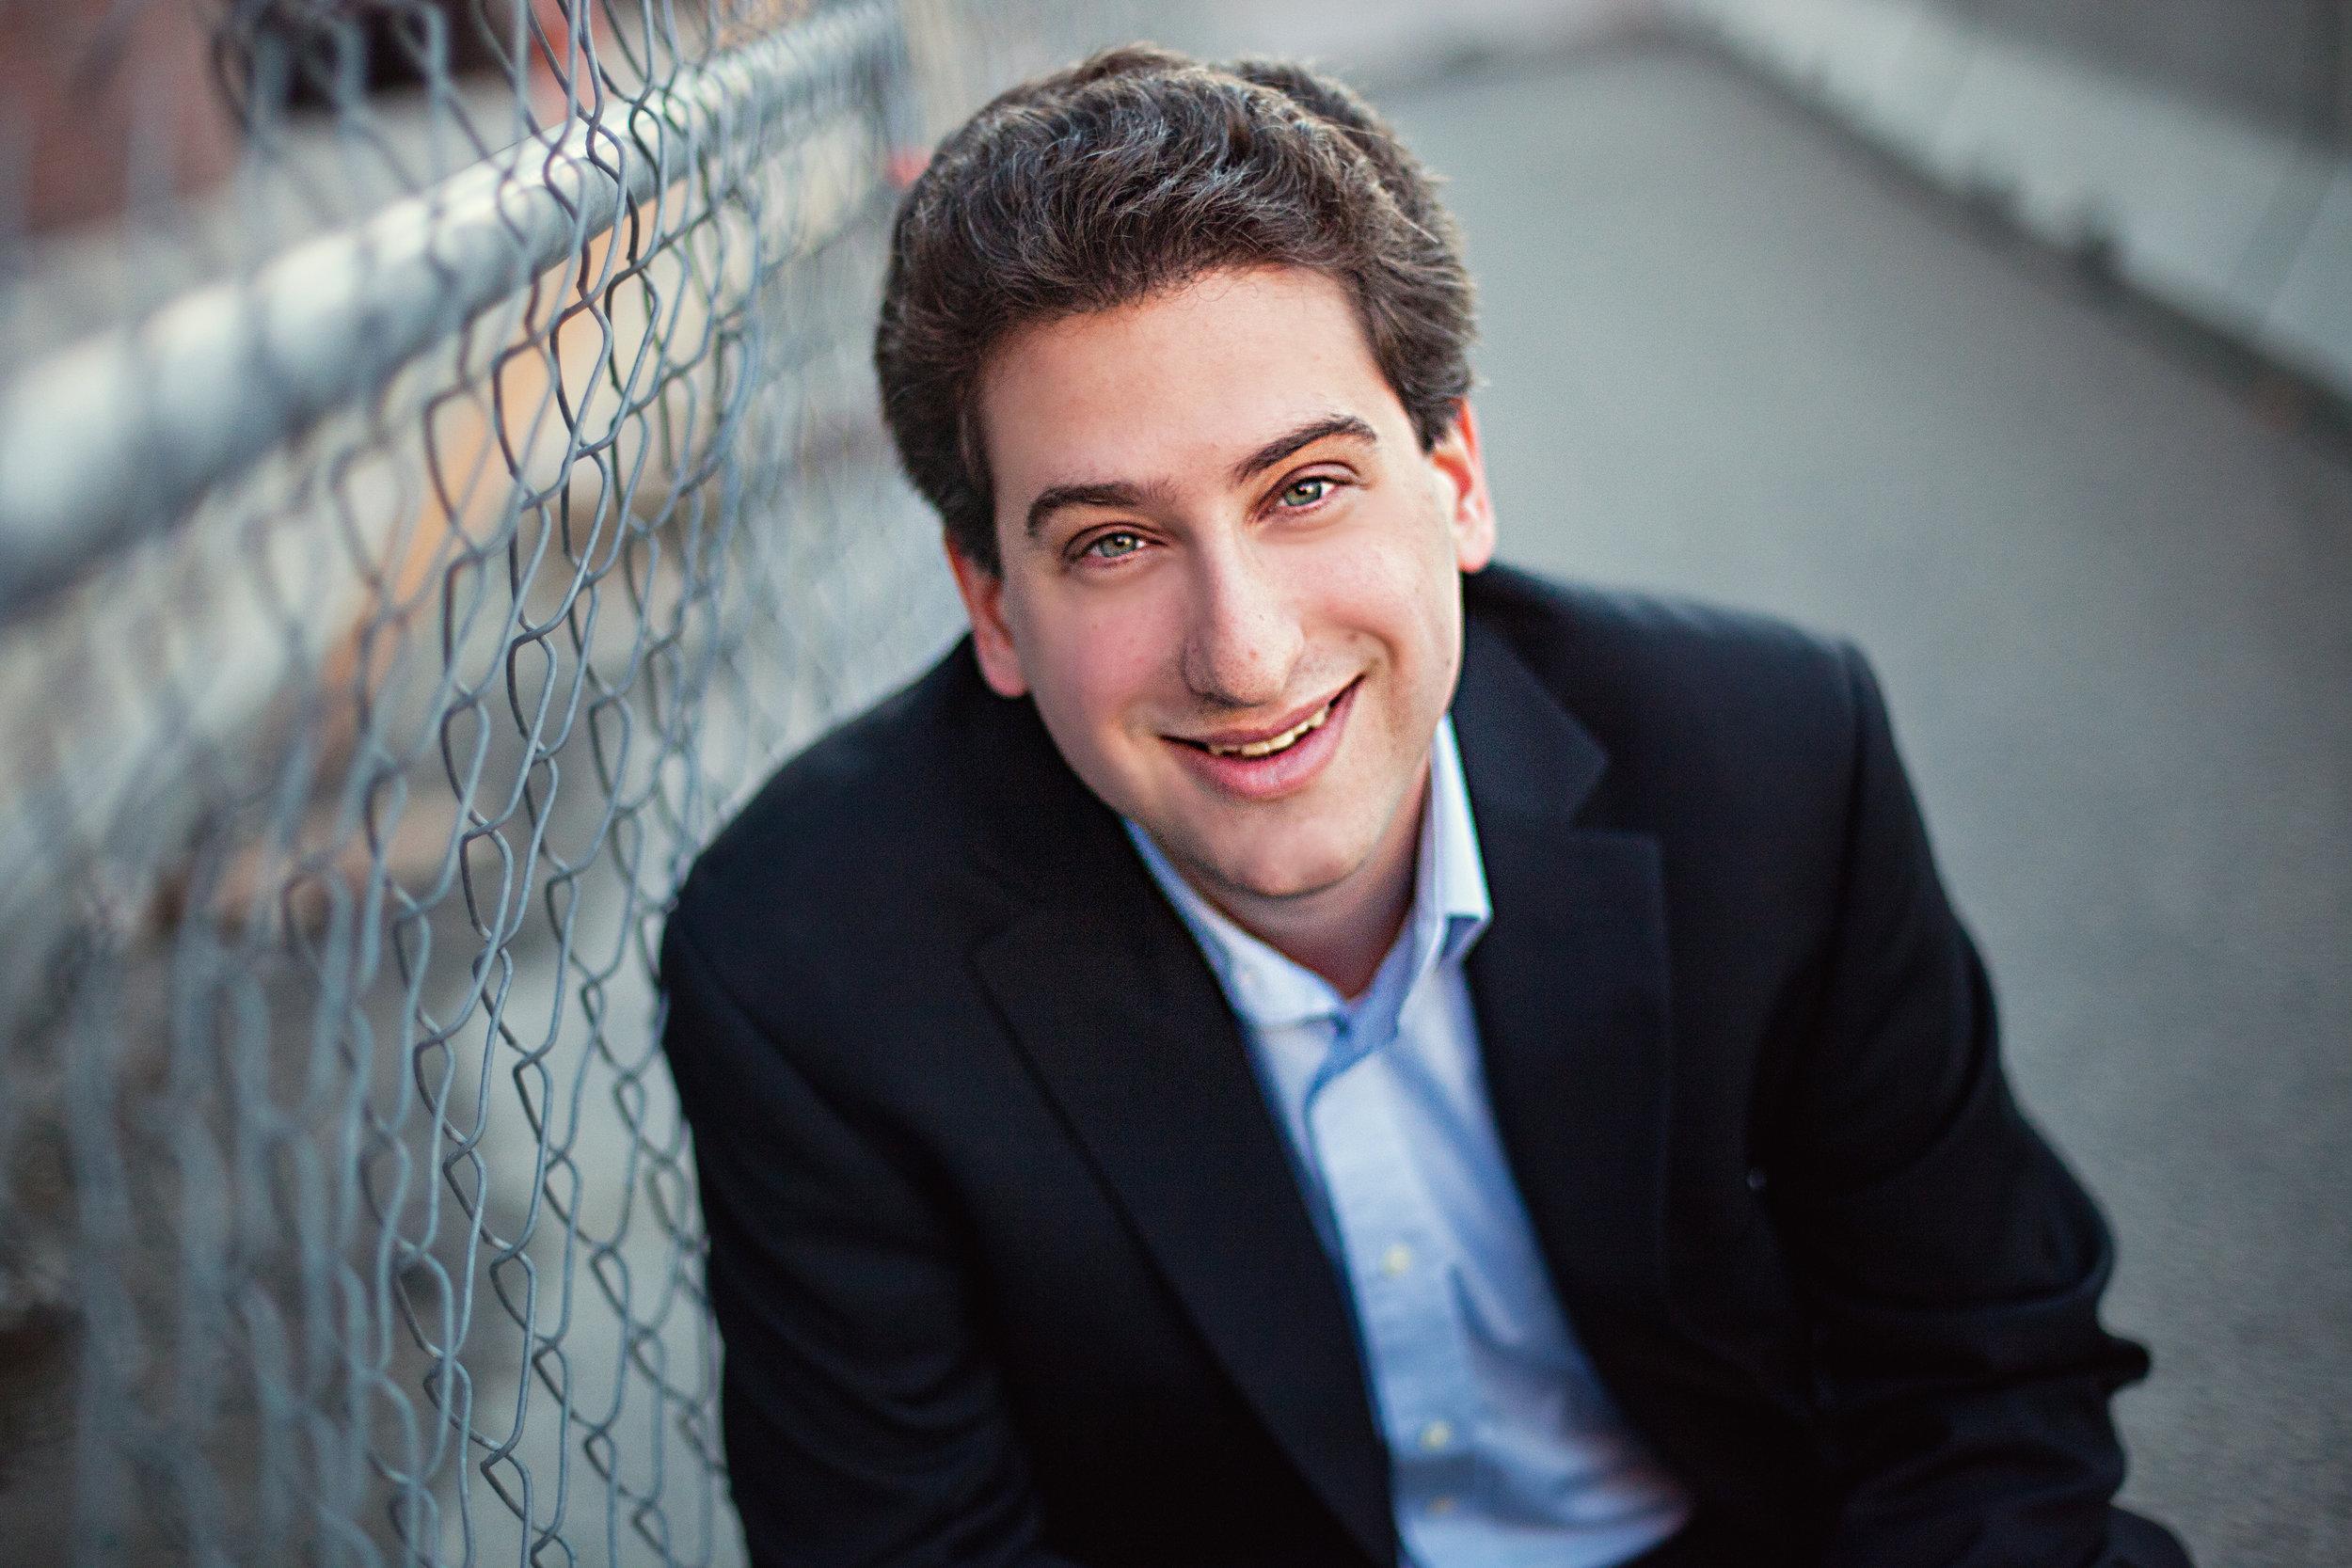 Matthew Szymanski, founder and music director of Phoenix Boston